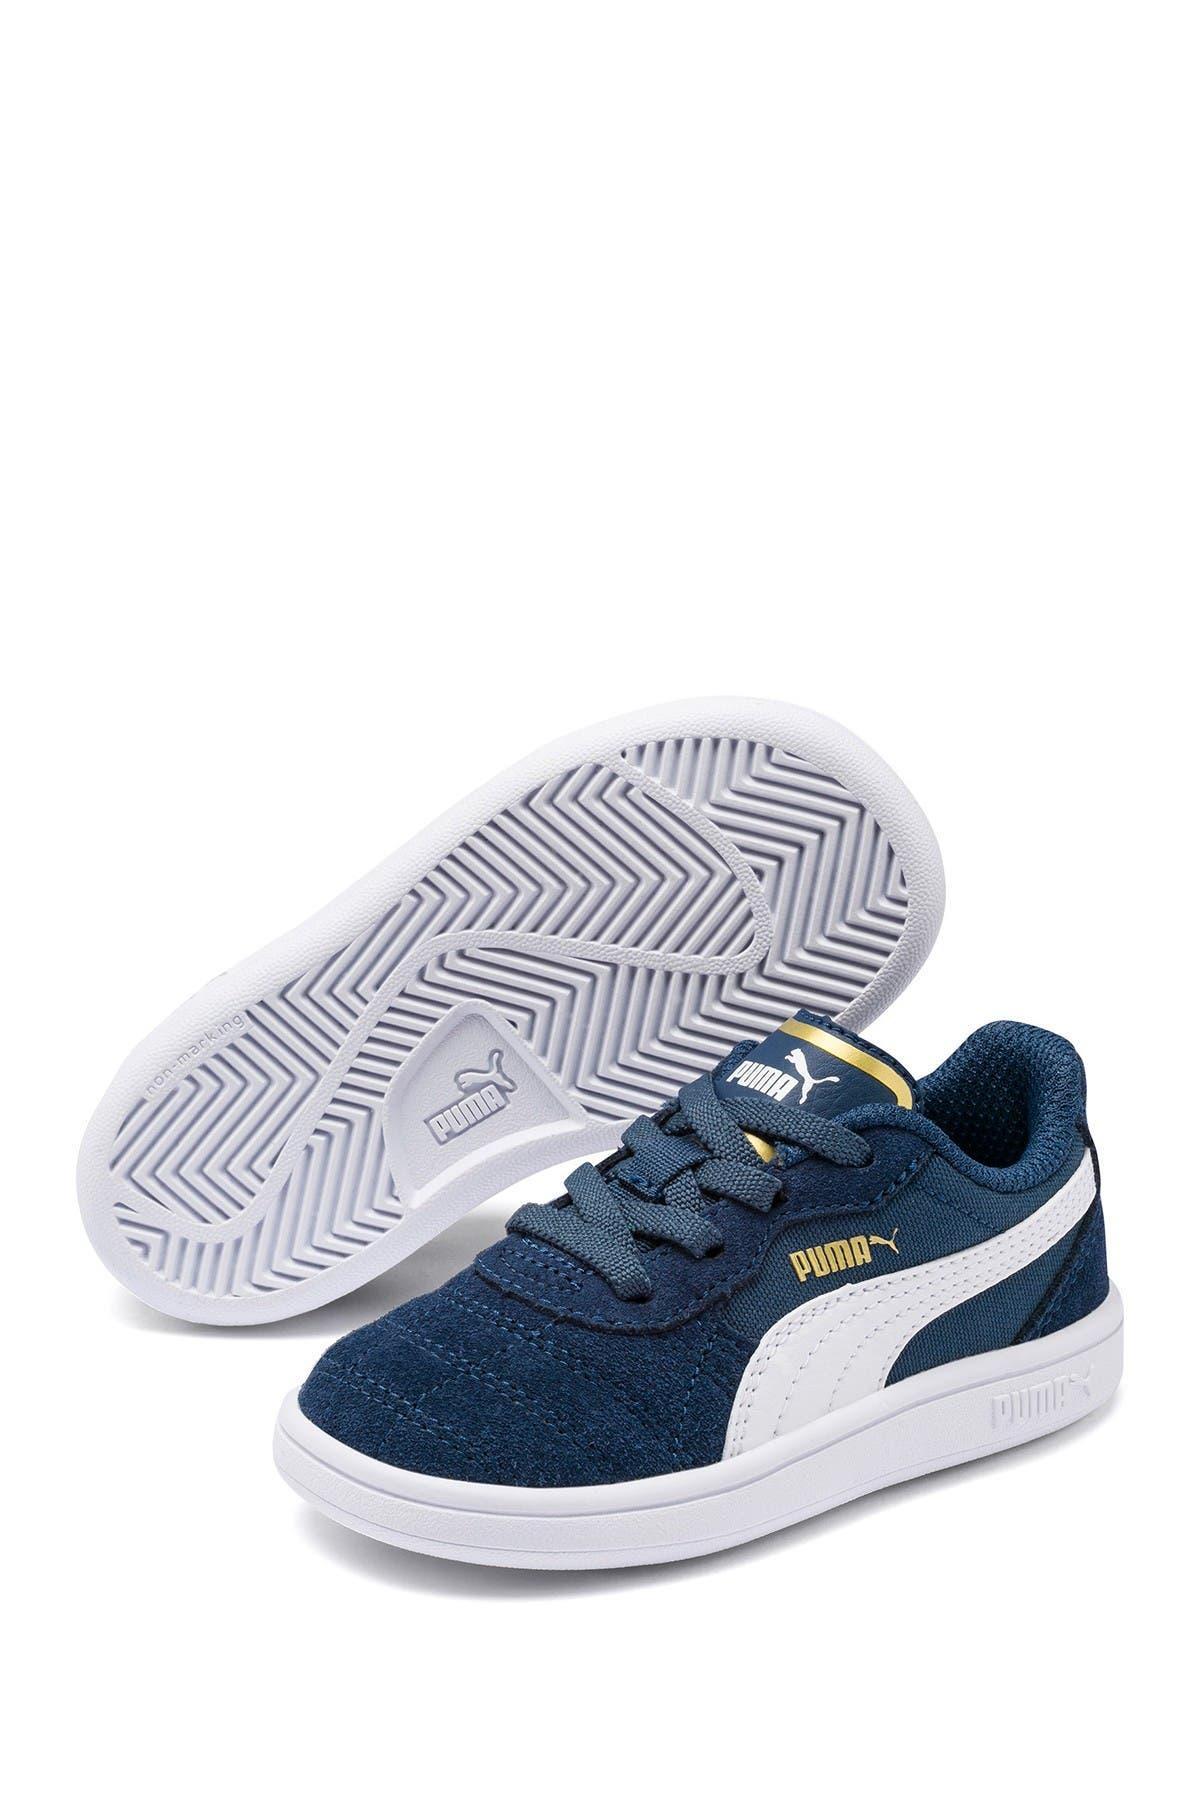 Image of PUMA Astro Kick Sneaker